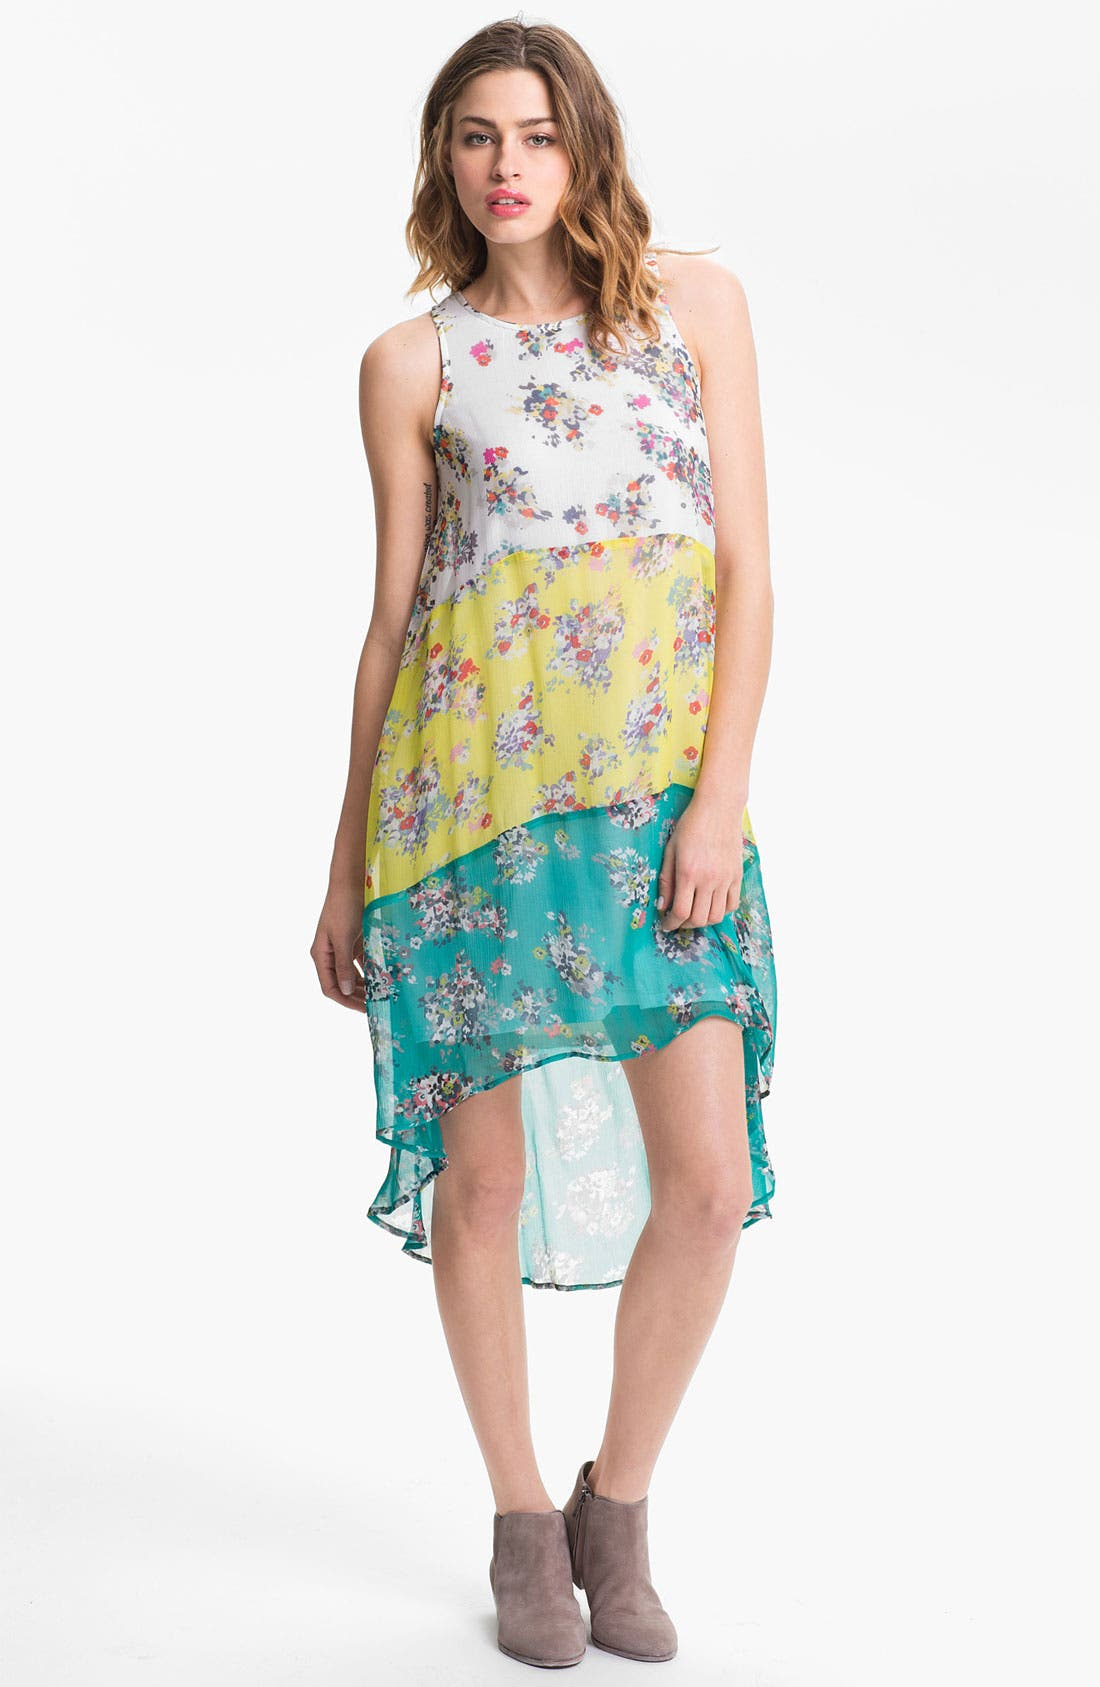 Main Image - Ella Moss 'Citrus' Mixed Print Tiered Chiffon Dress